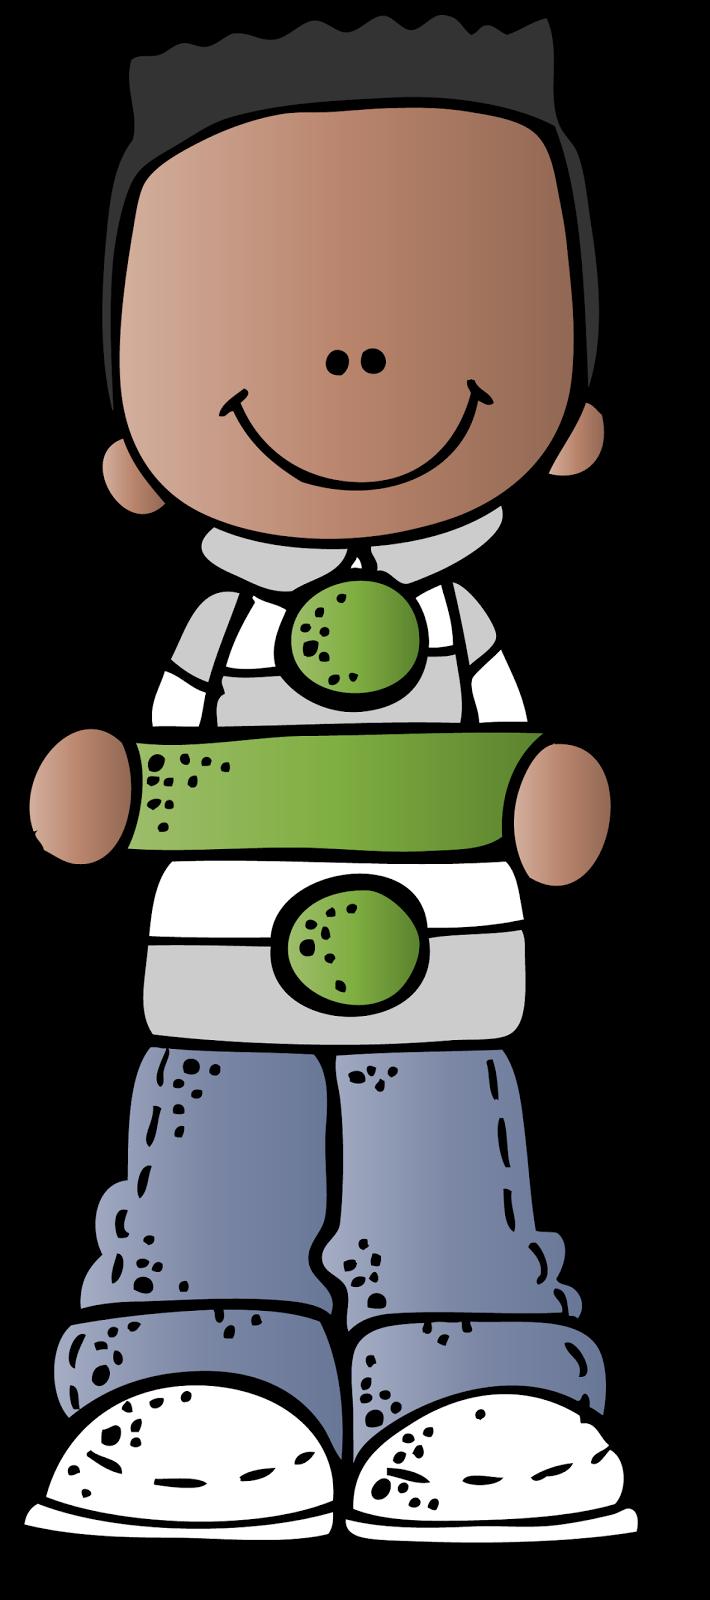 Boy with book clipart clip transparent download melonheadz boy - Google Search | Melonheadz | Pinterest | Google ... clip transparent download